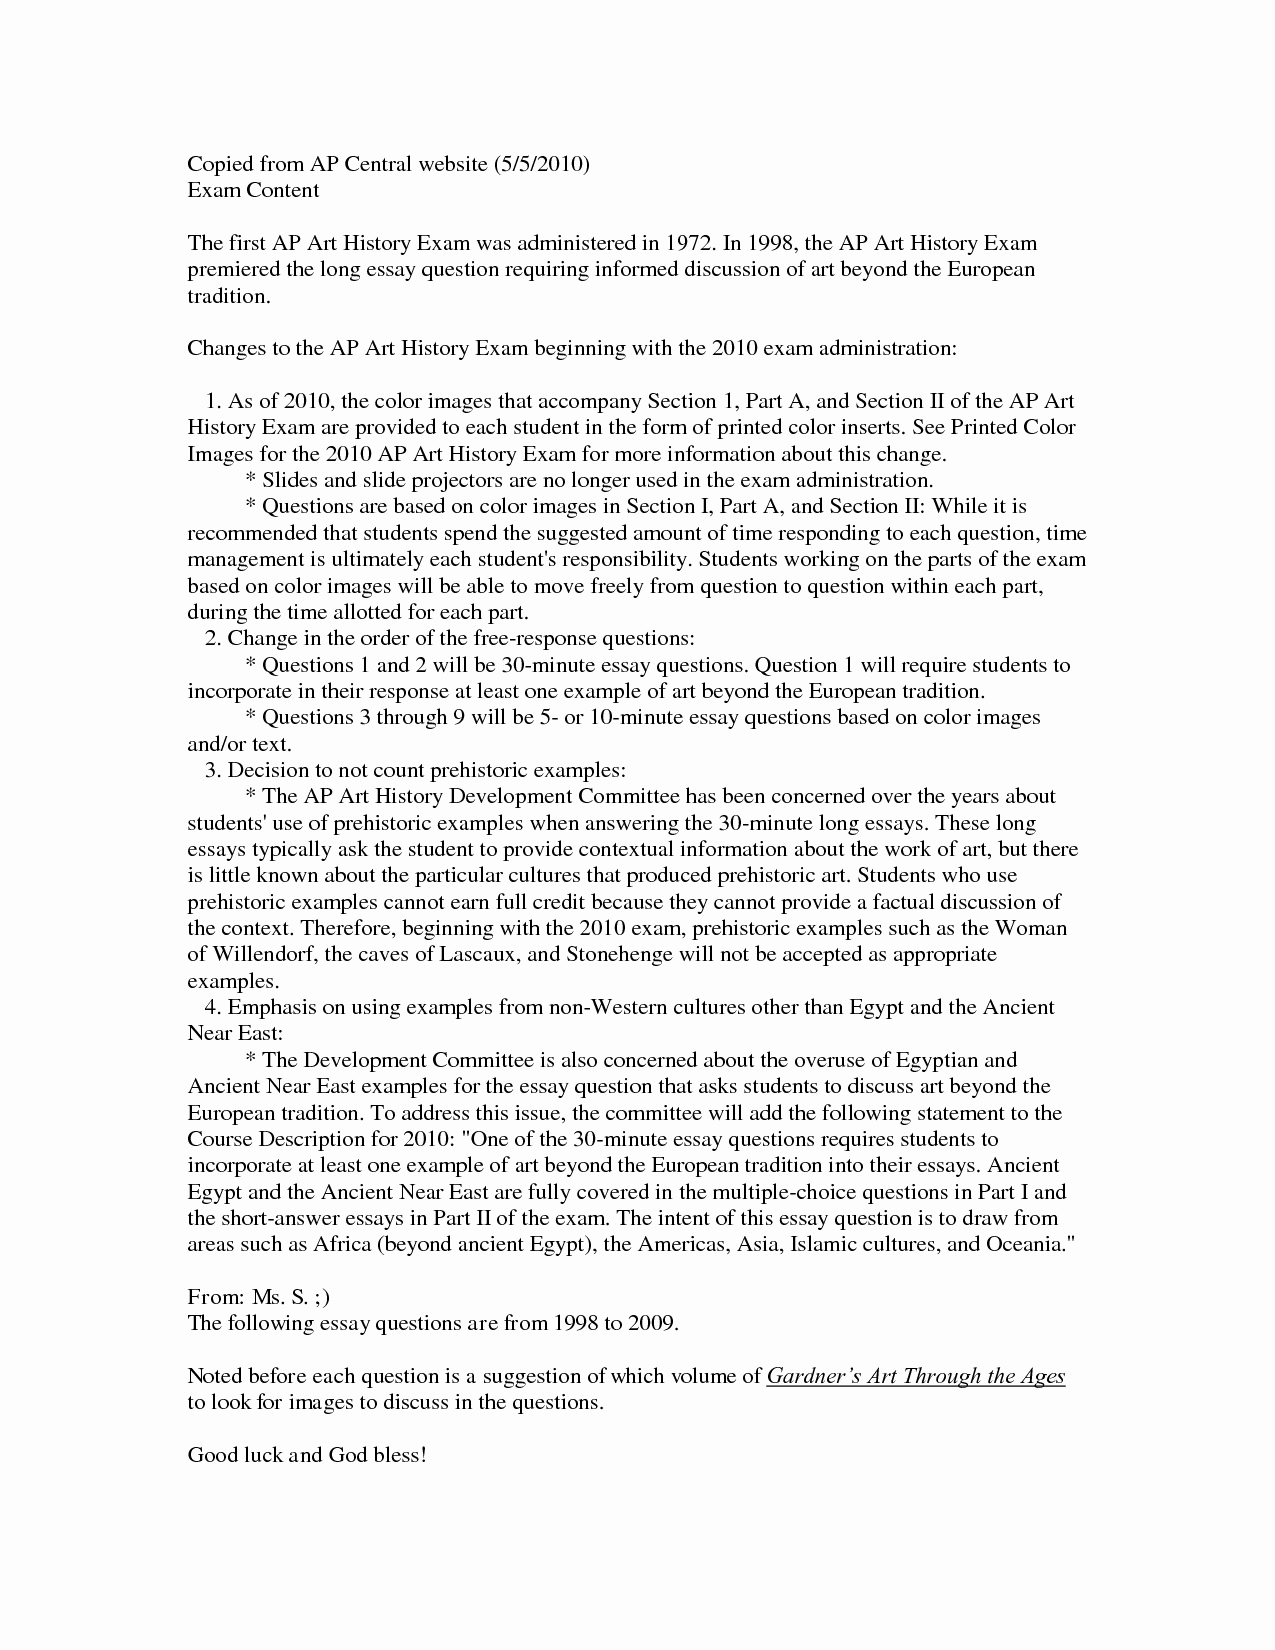 Sat Essay Template Pdf Inspirational 57 Writing A History Essay How to Write A Good